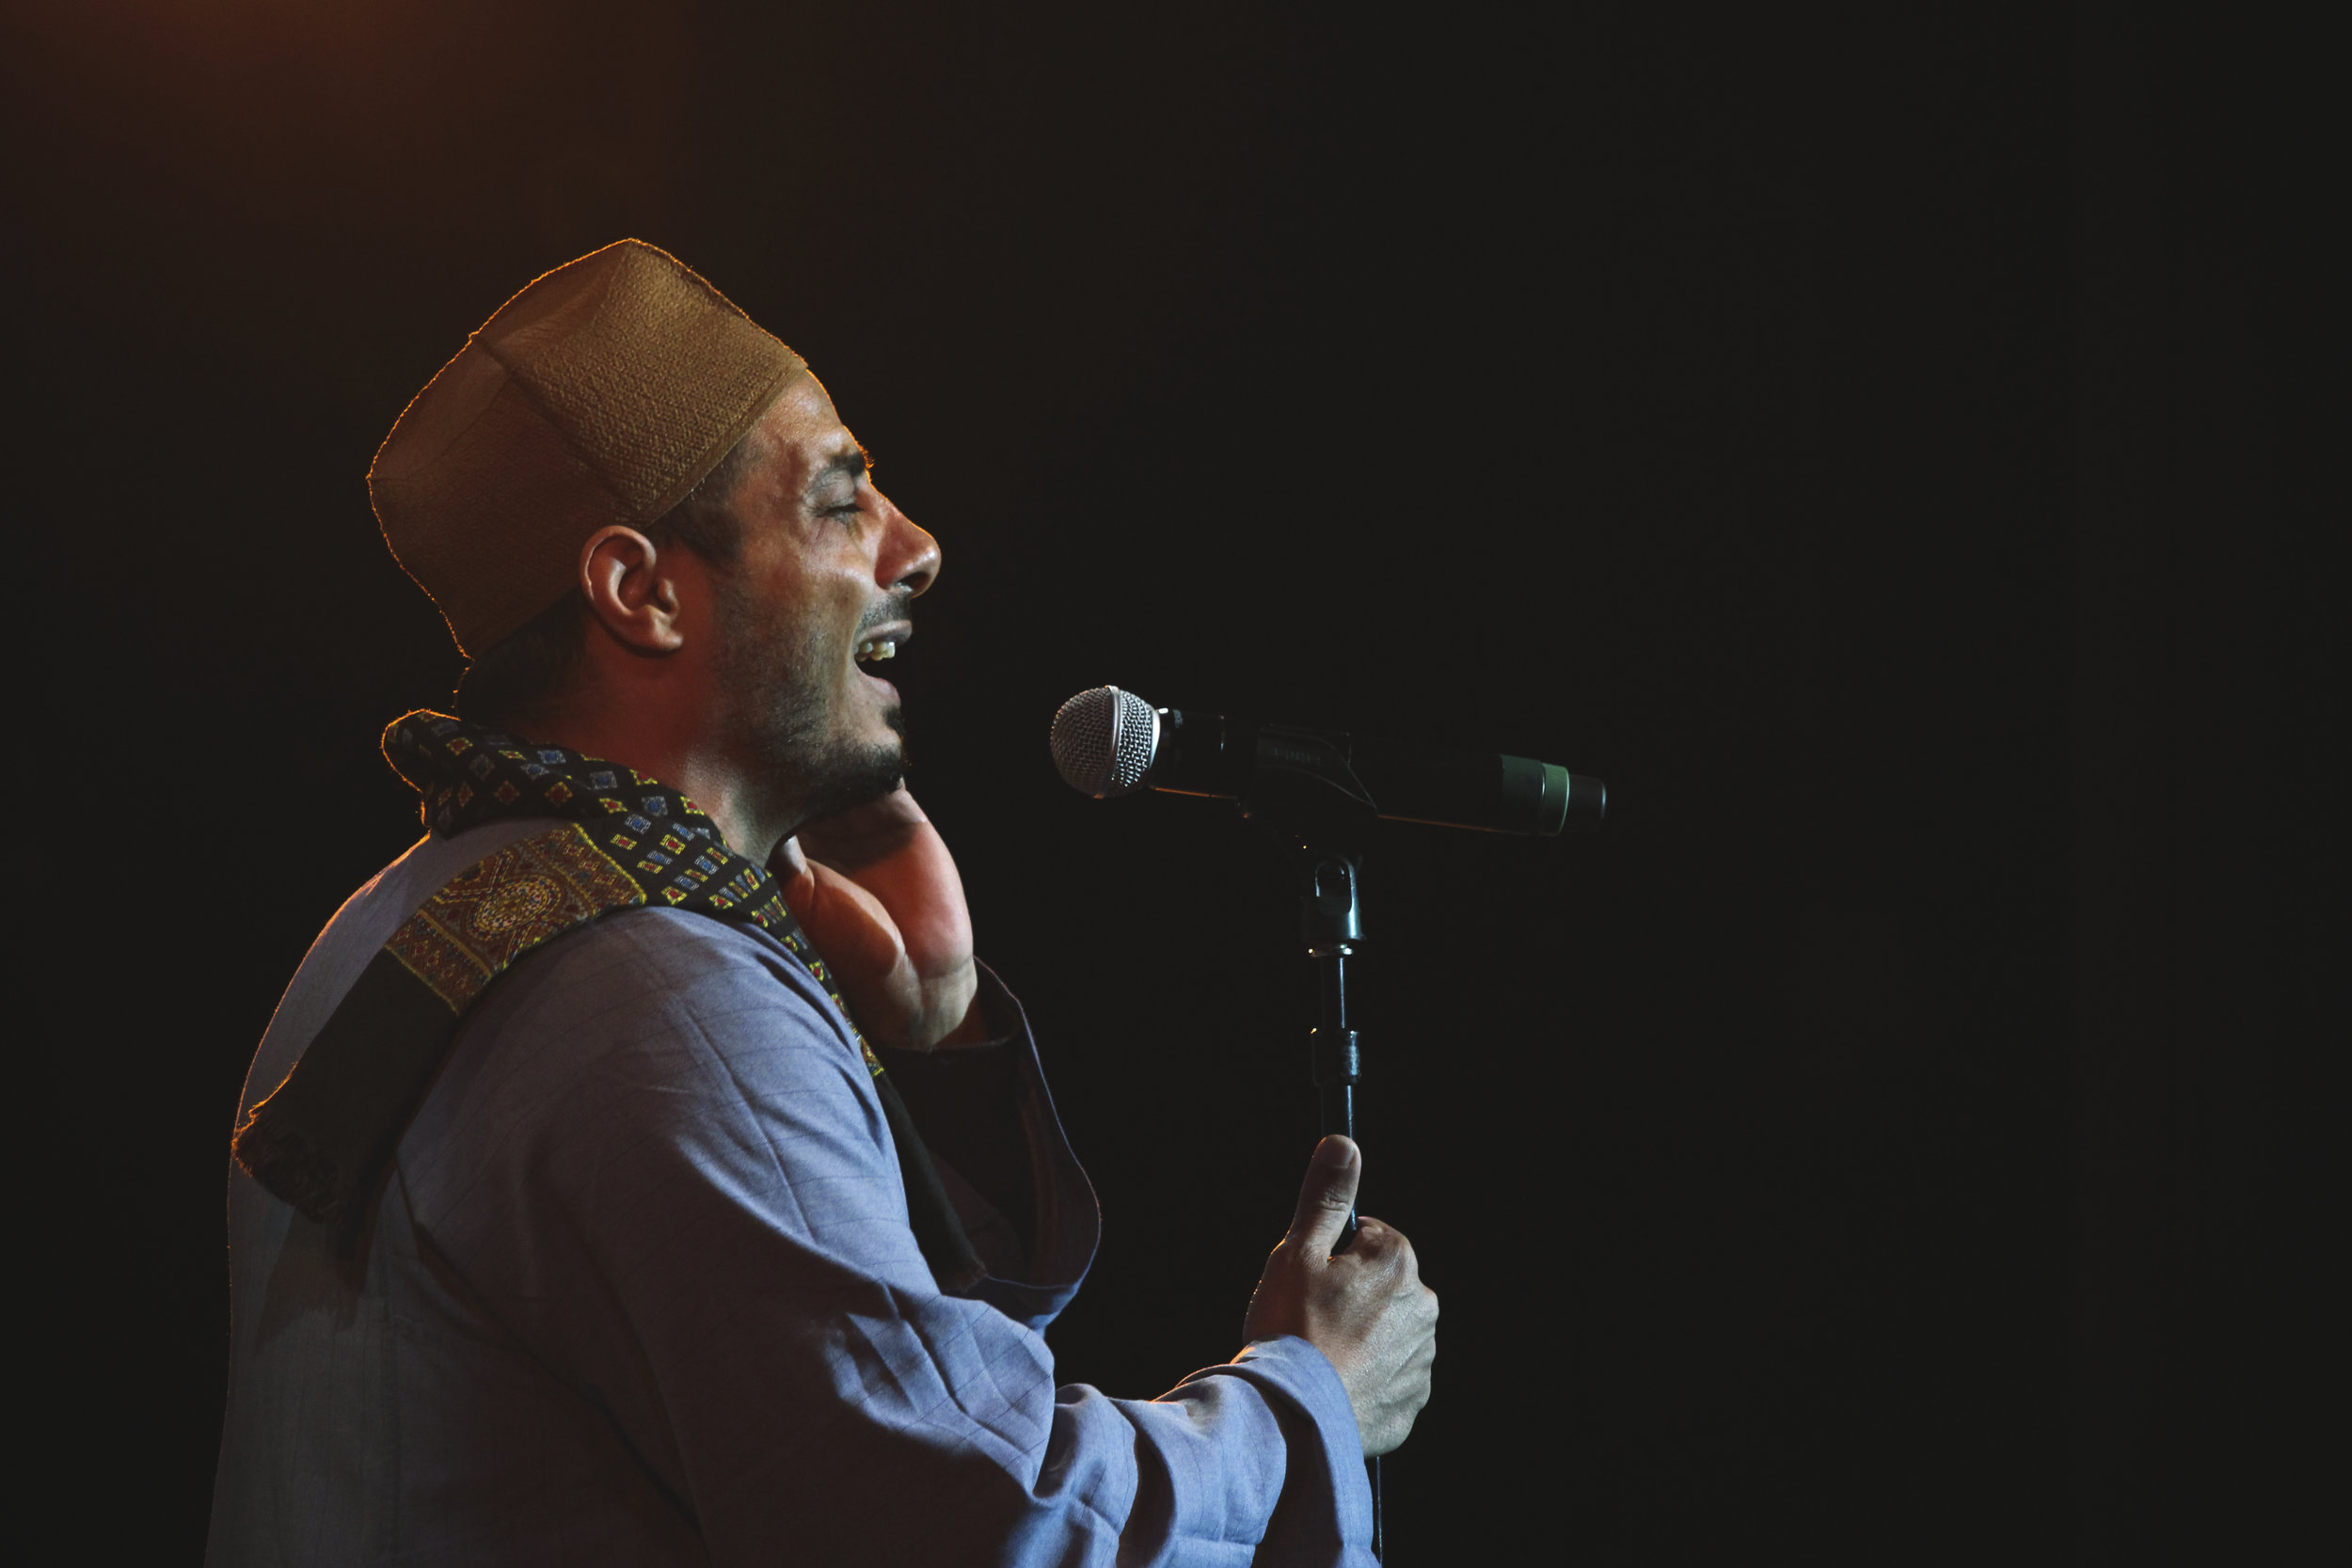 Saleeb Fawzy